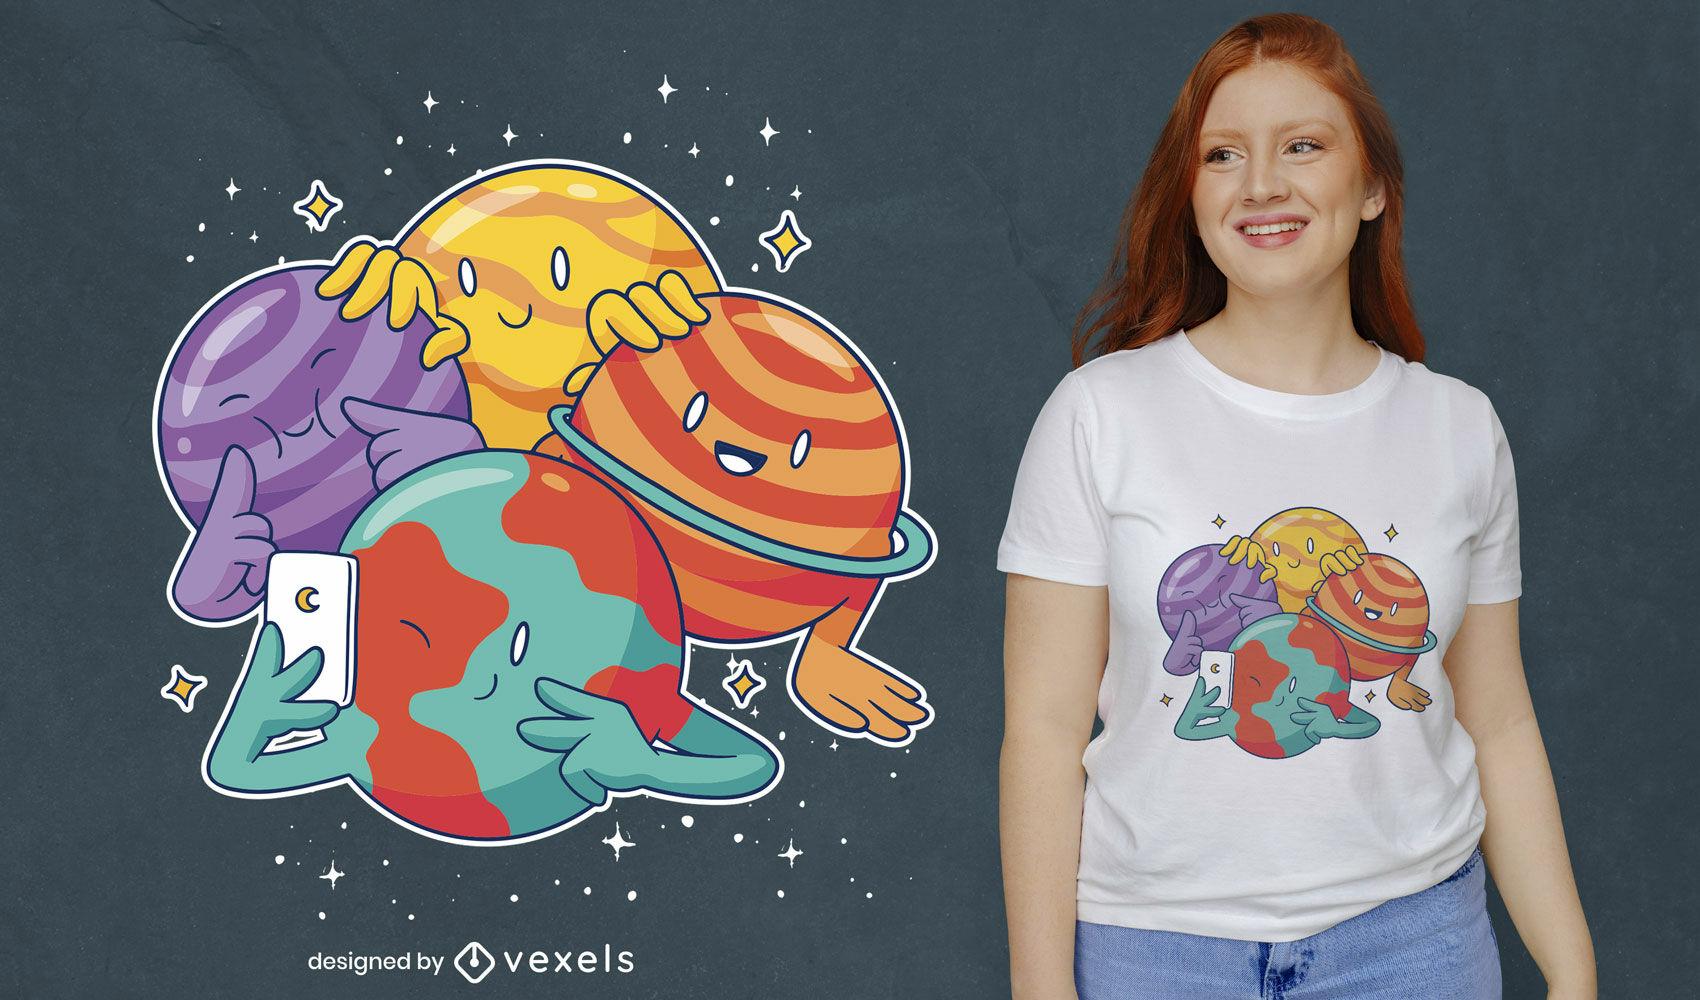 Planets space selfie cute t-shirt design